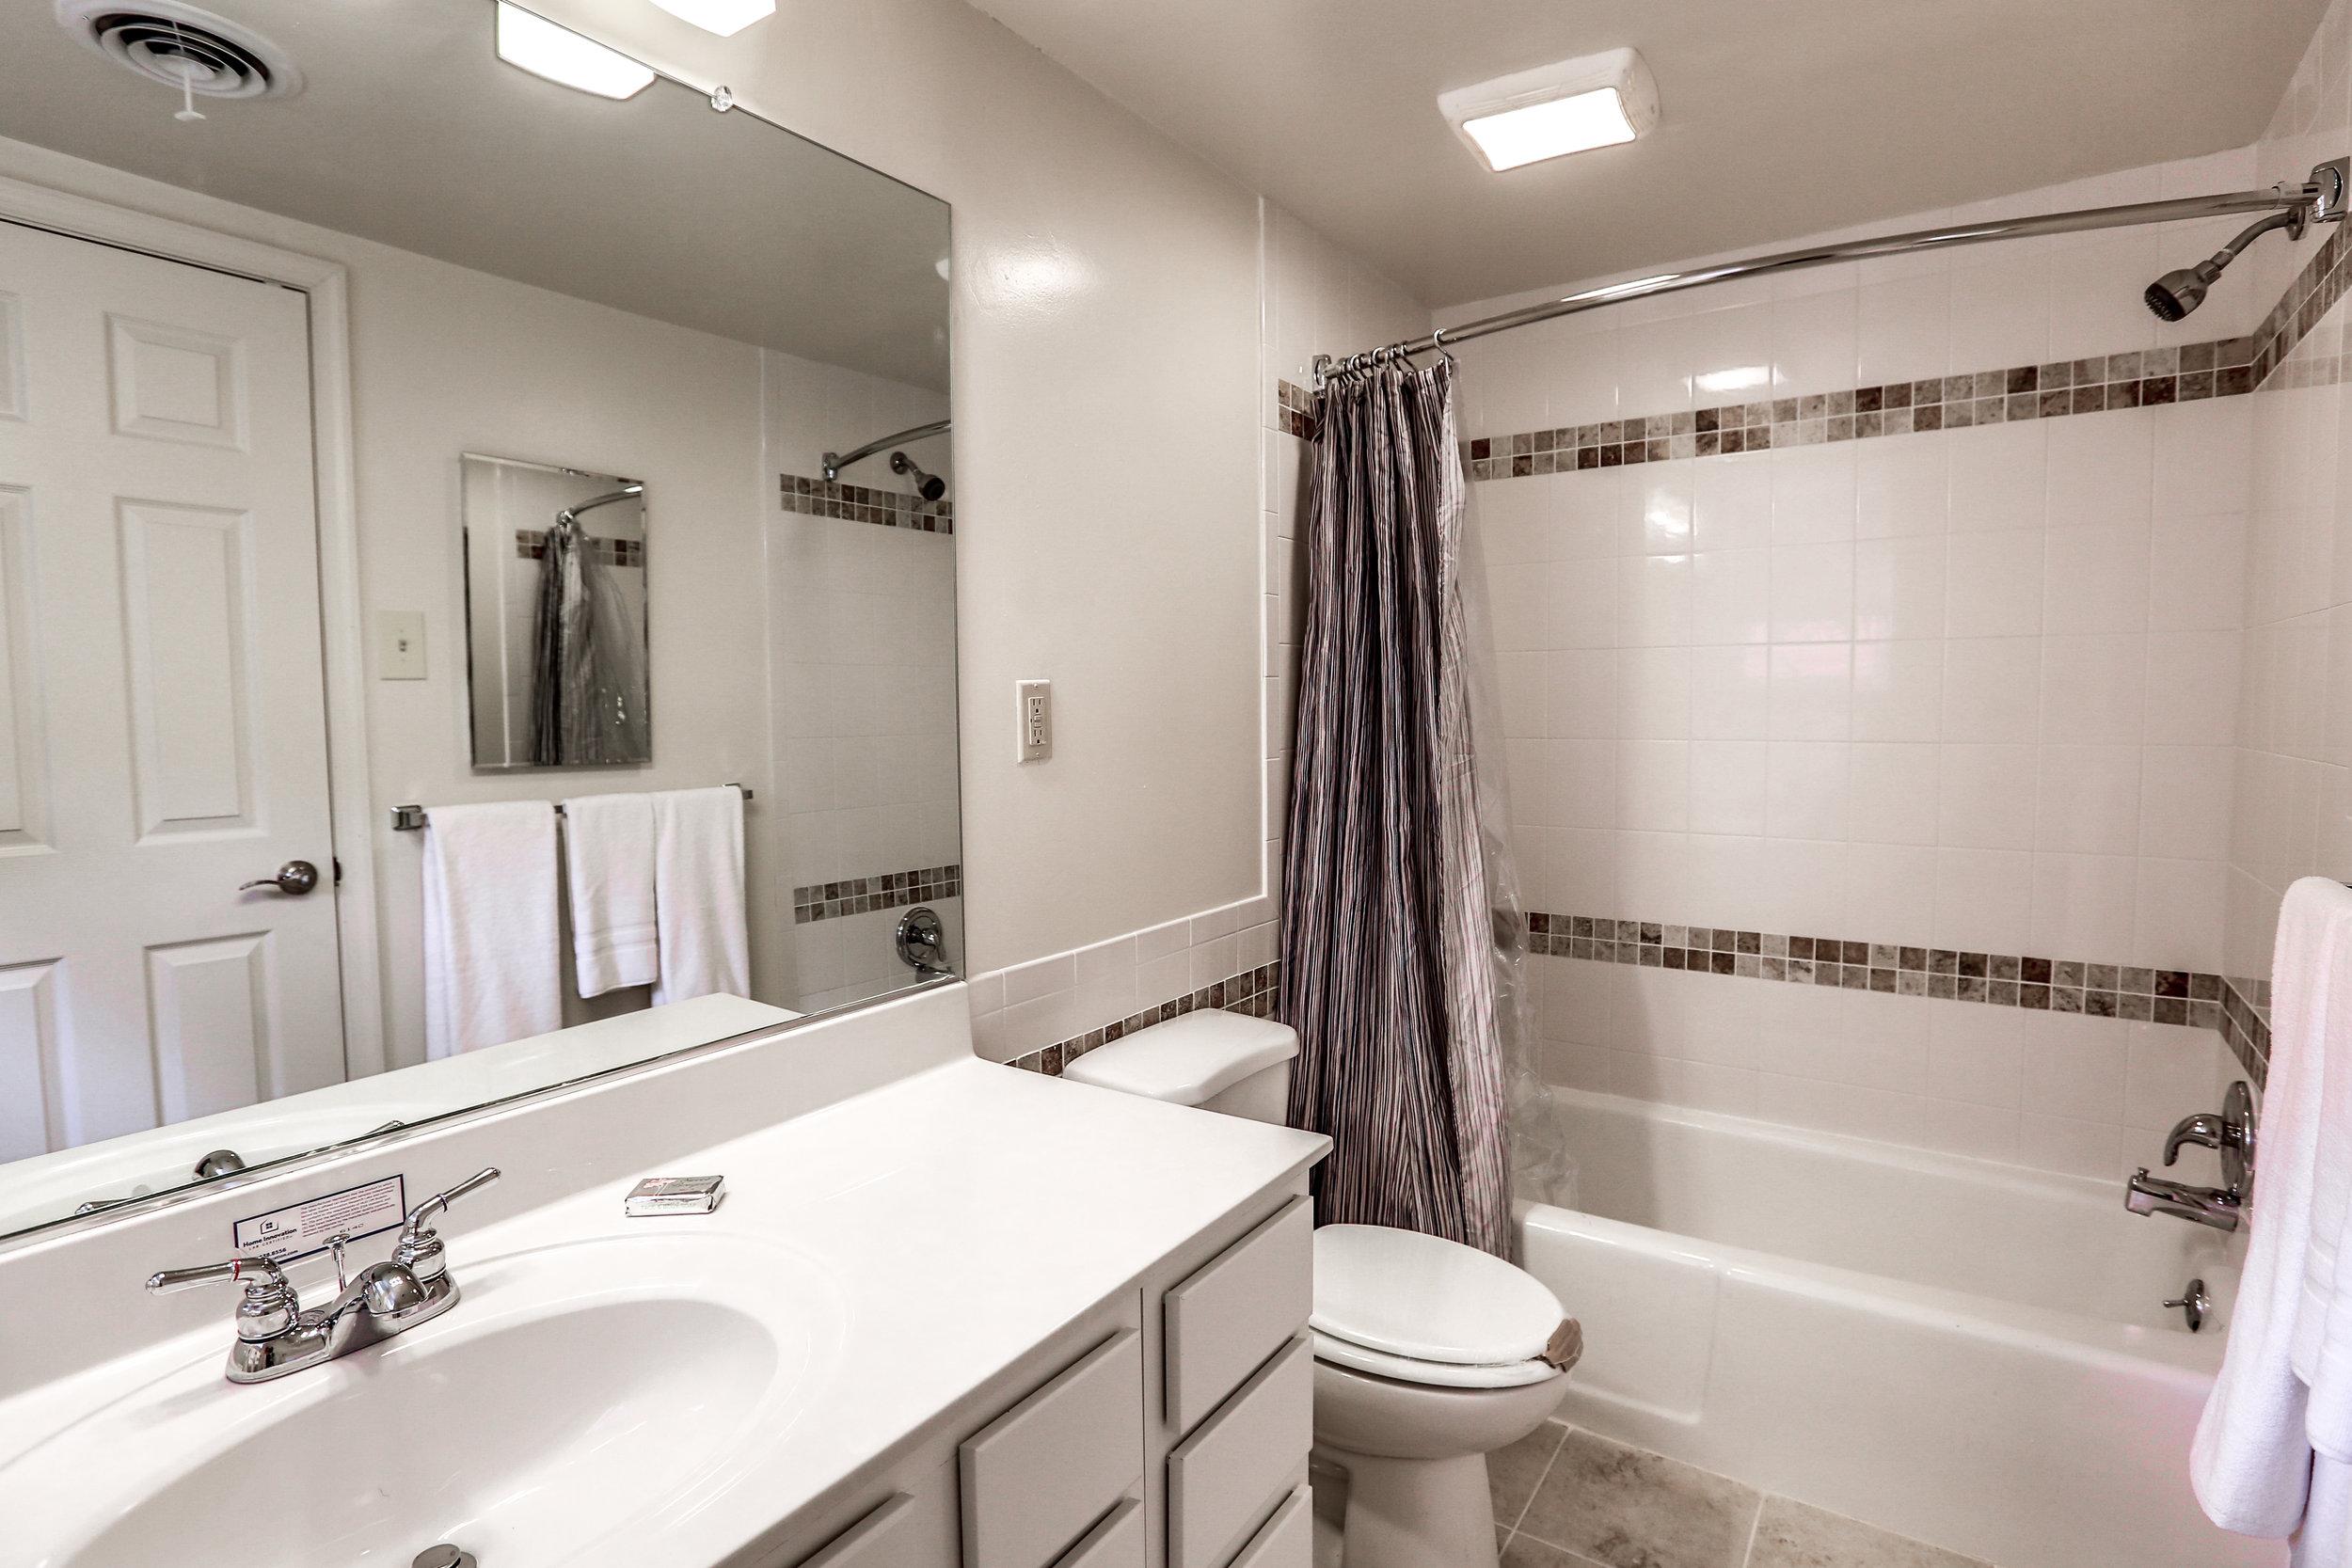 Premium Bathroom Tiles, Cultured Marble Vanity